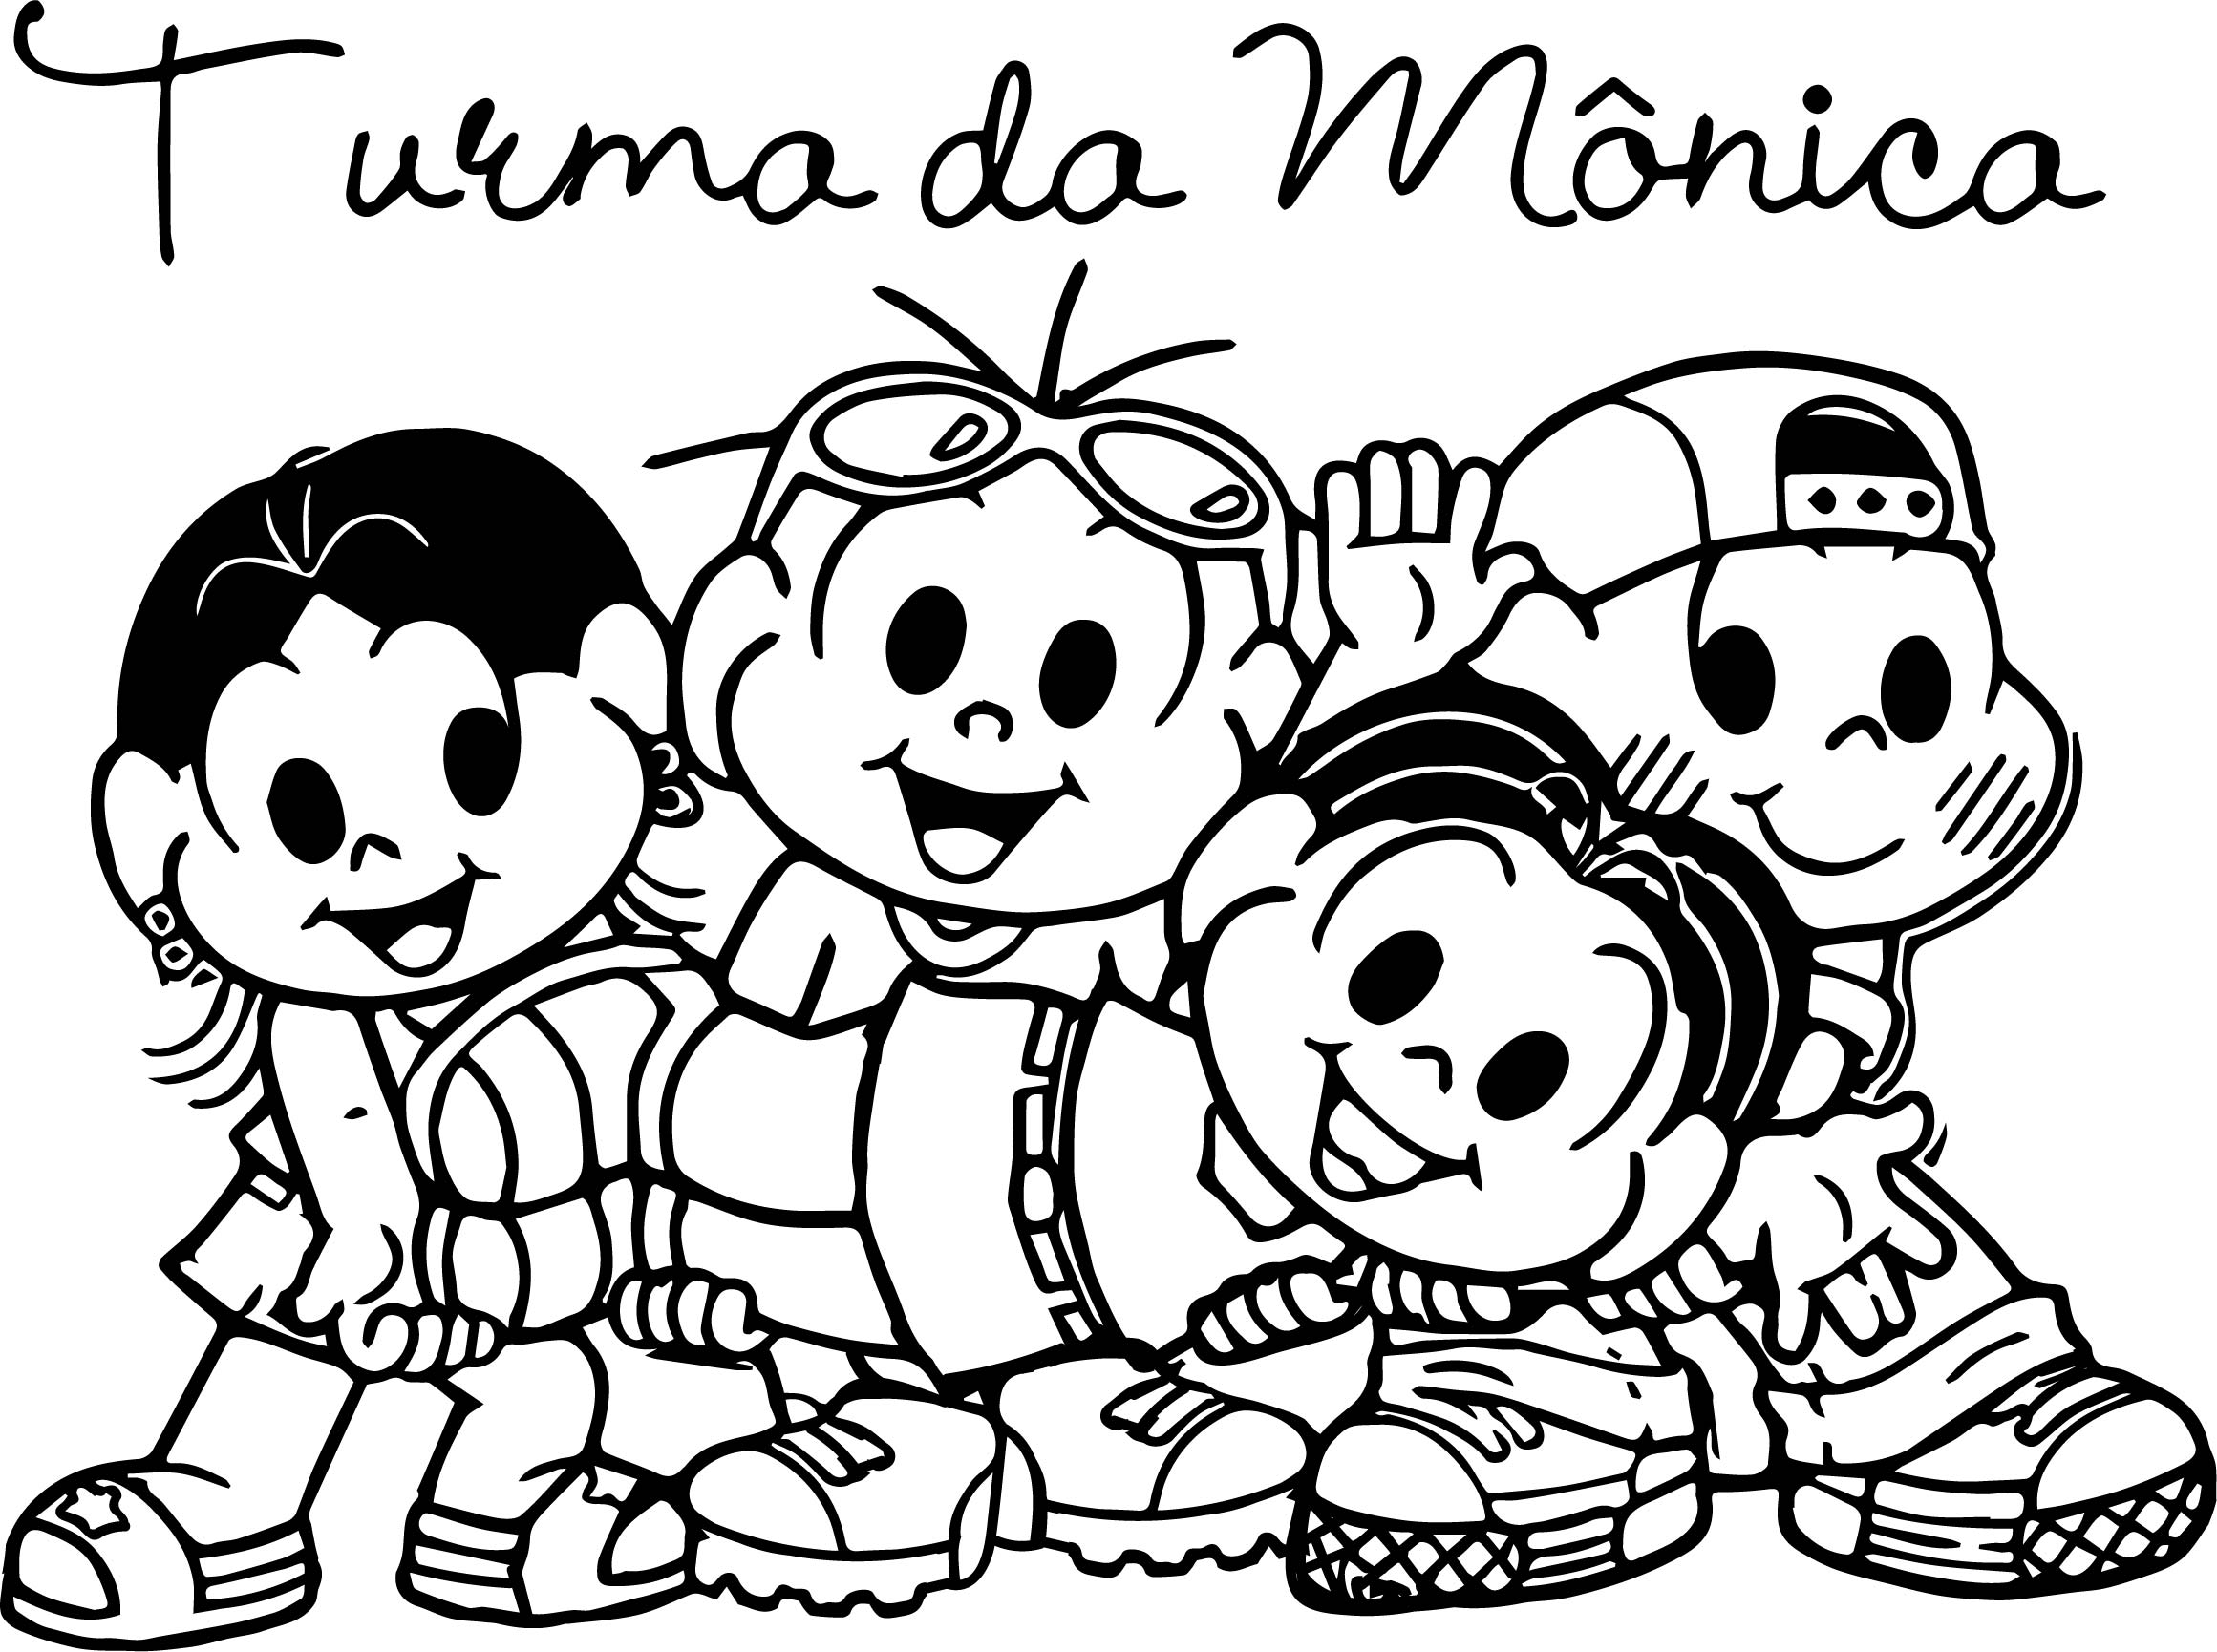 Turma Da Monica Selfie Coloring Page Wecoloringpage